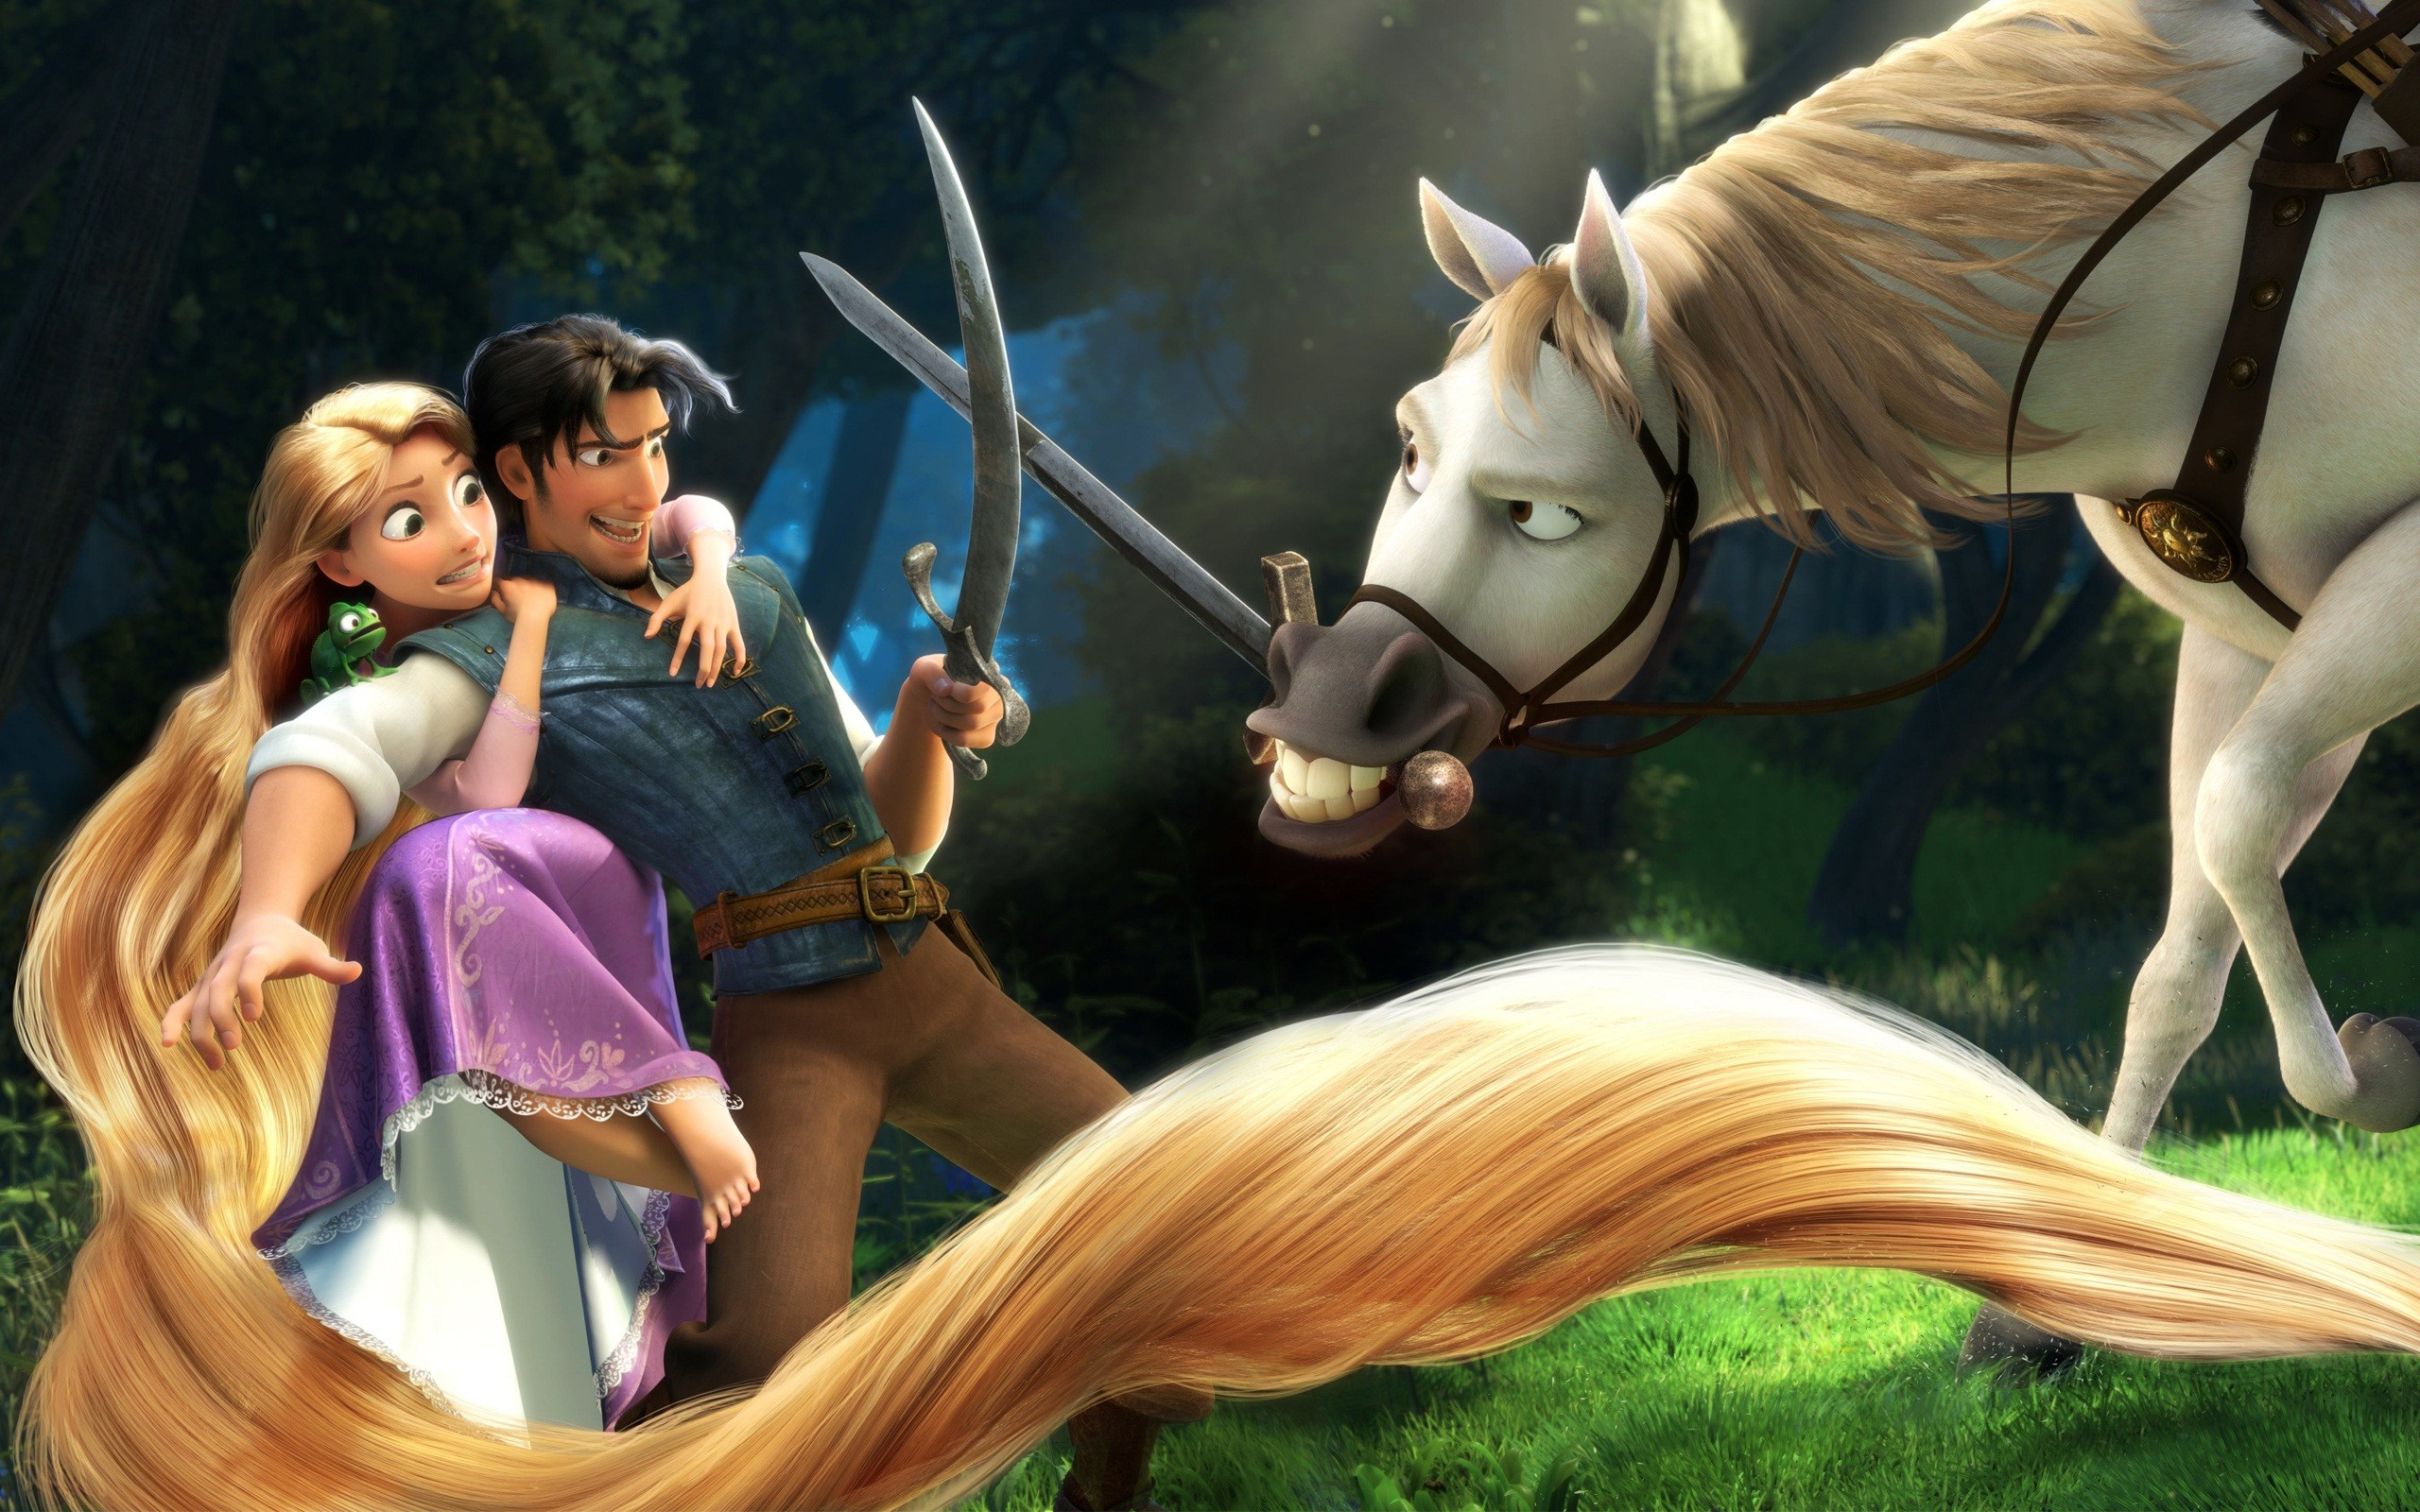 Rapunzel & Flynn in Tangled Wallpapers | HD Wallpapers